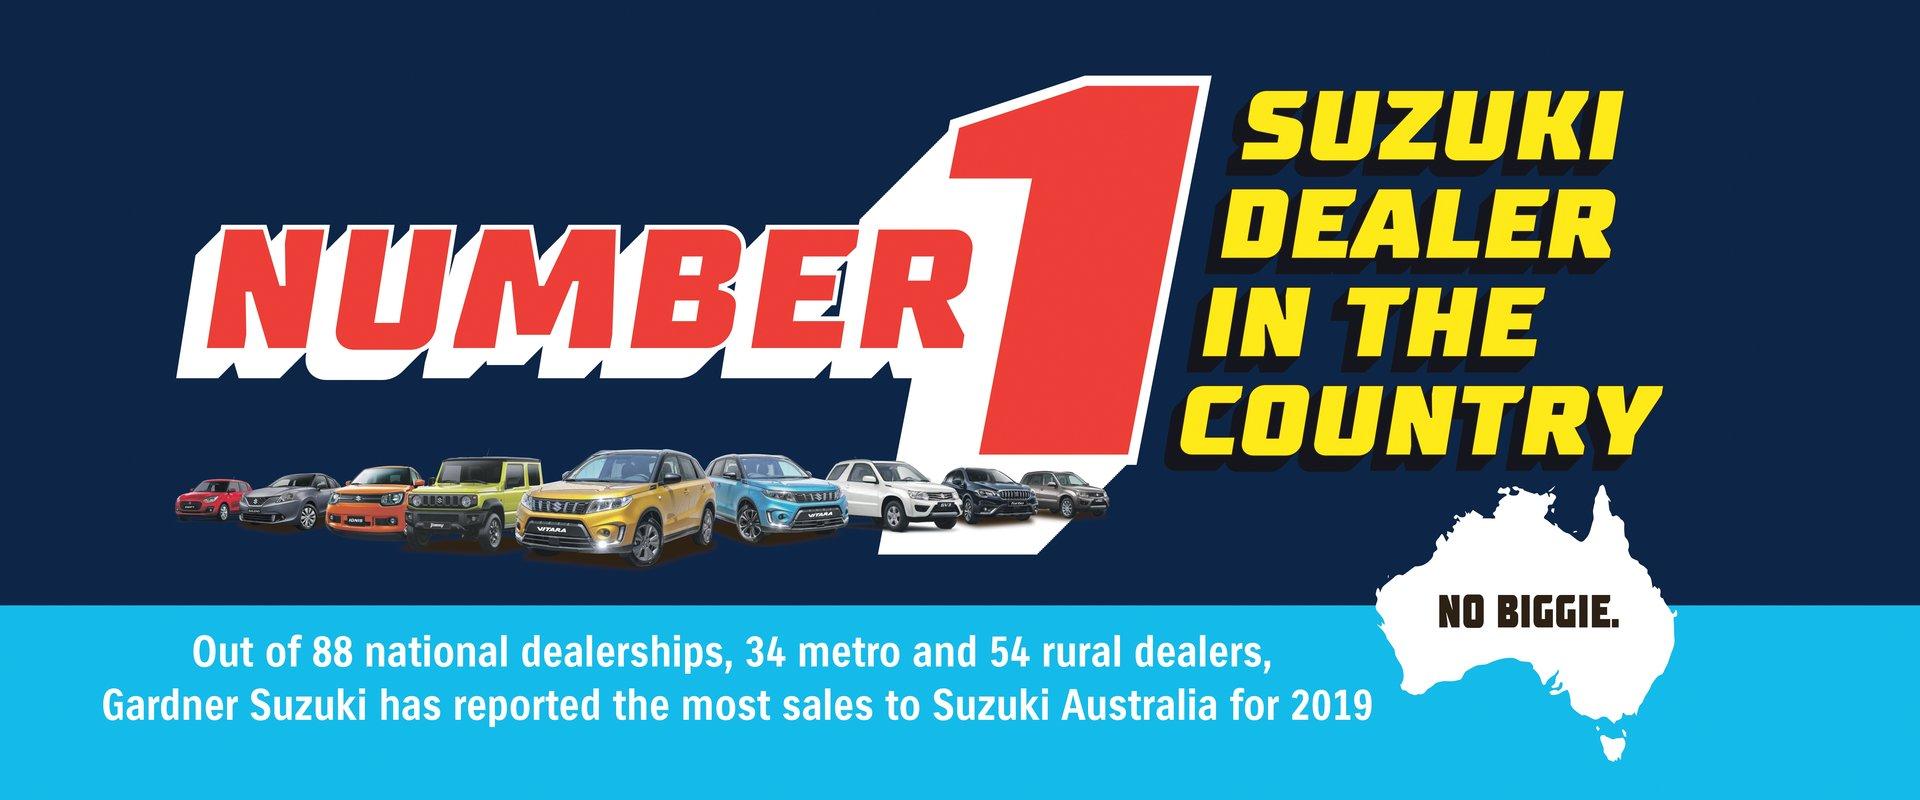 Number 1 Suzuki Dealer in the Country